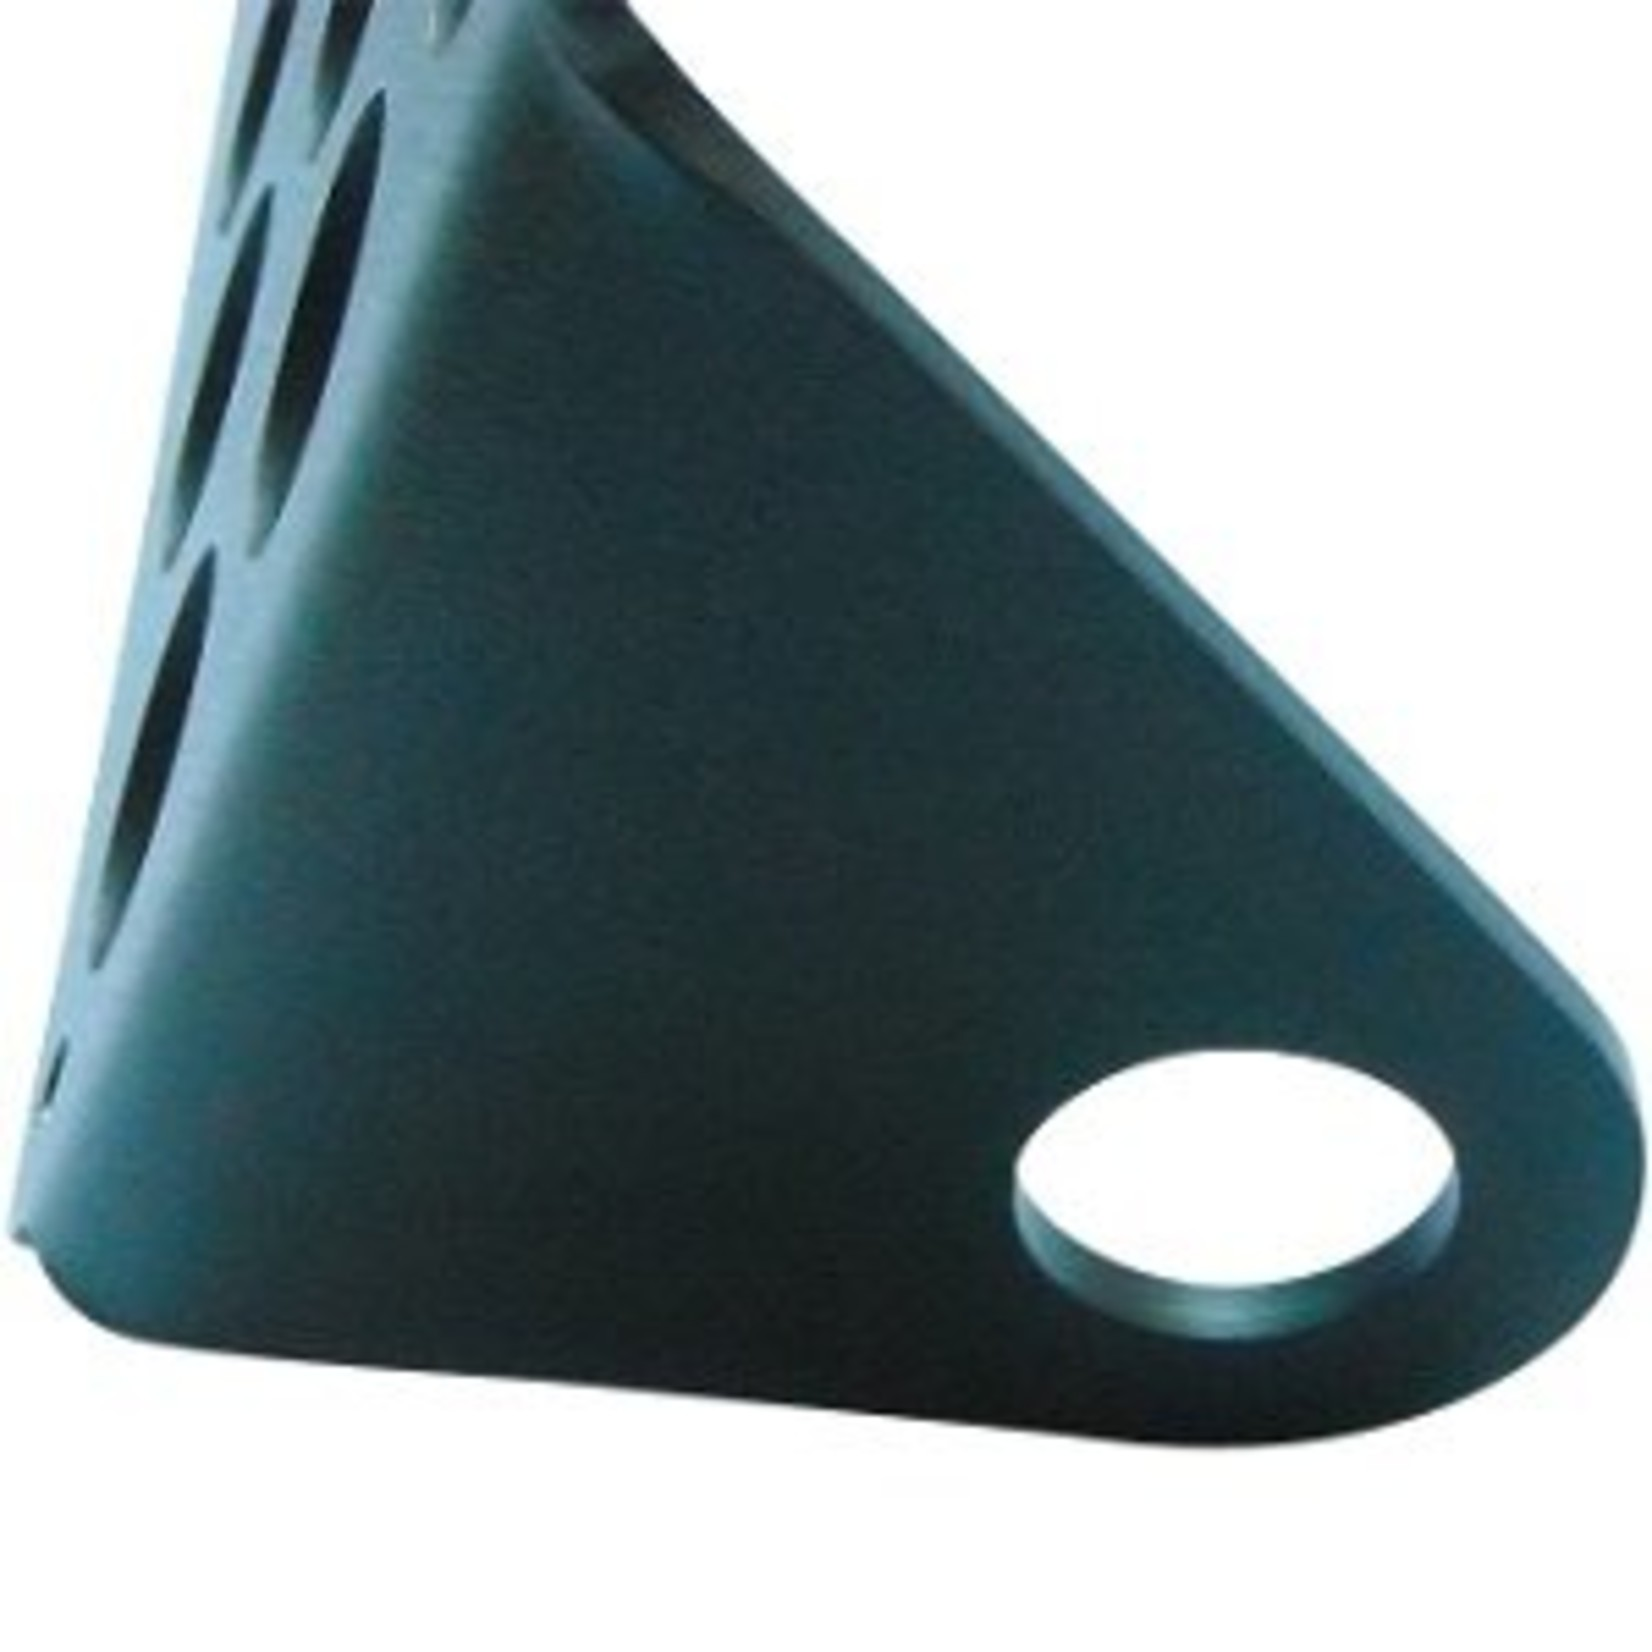 Side Mount kentekenplaathouder met LED STOP-lamp voor motorfiets